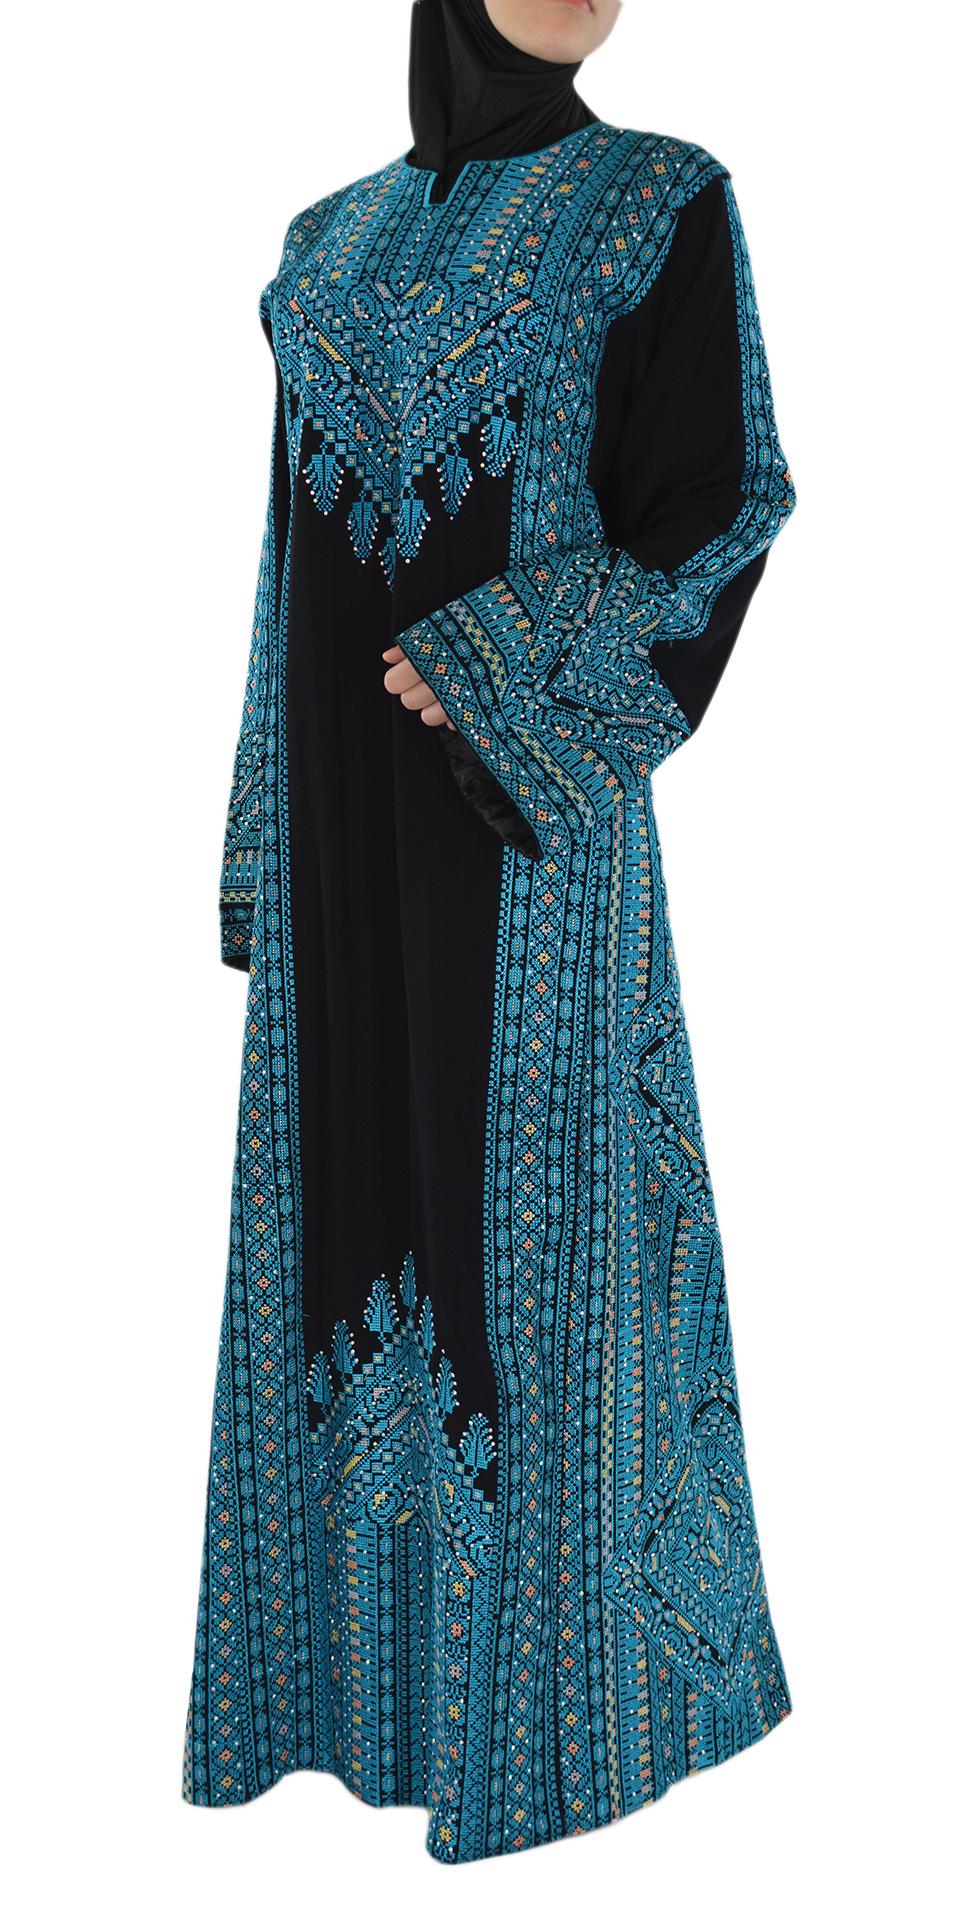 Blue Fallah Dress Side Shot